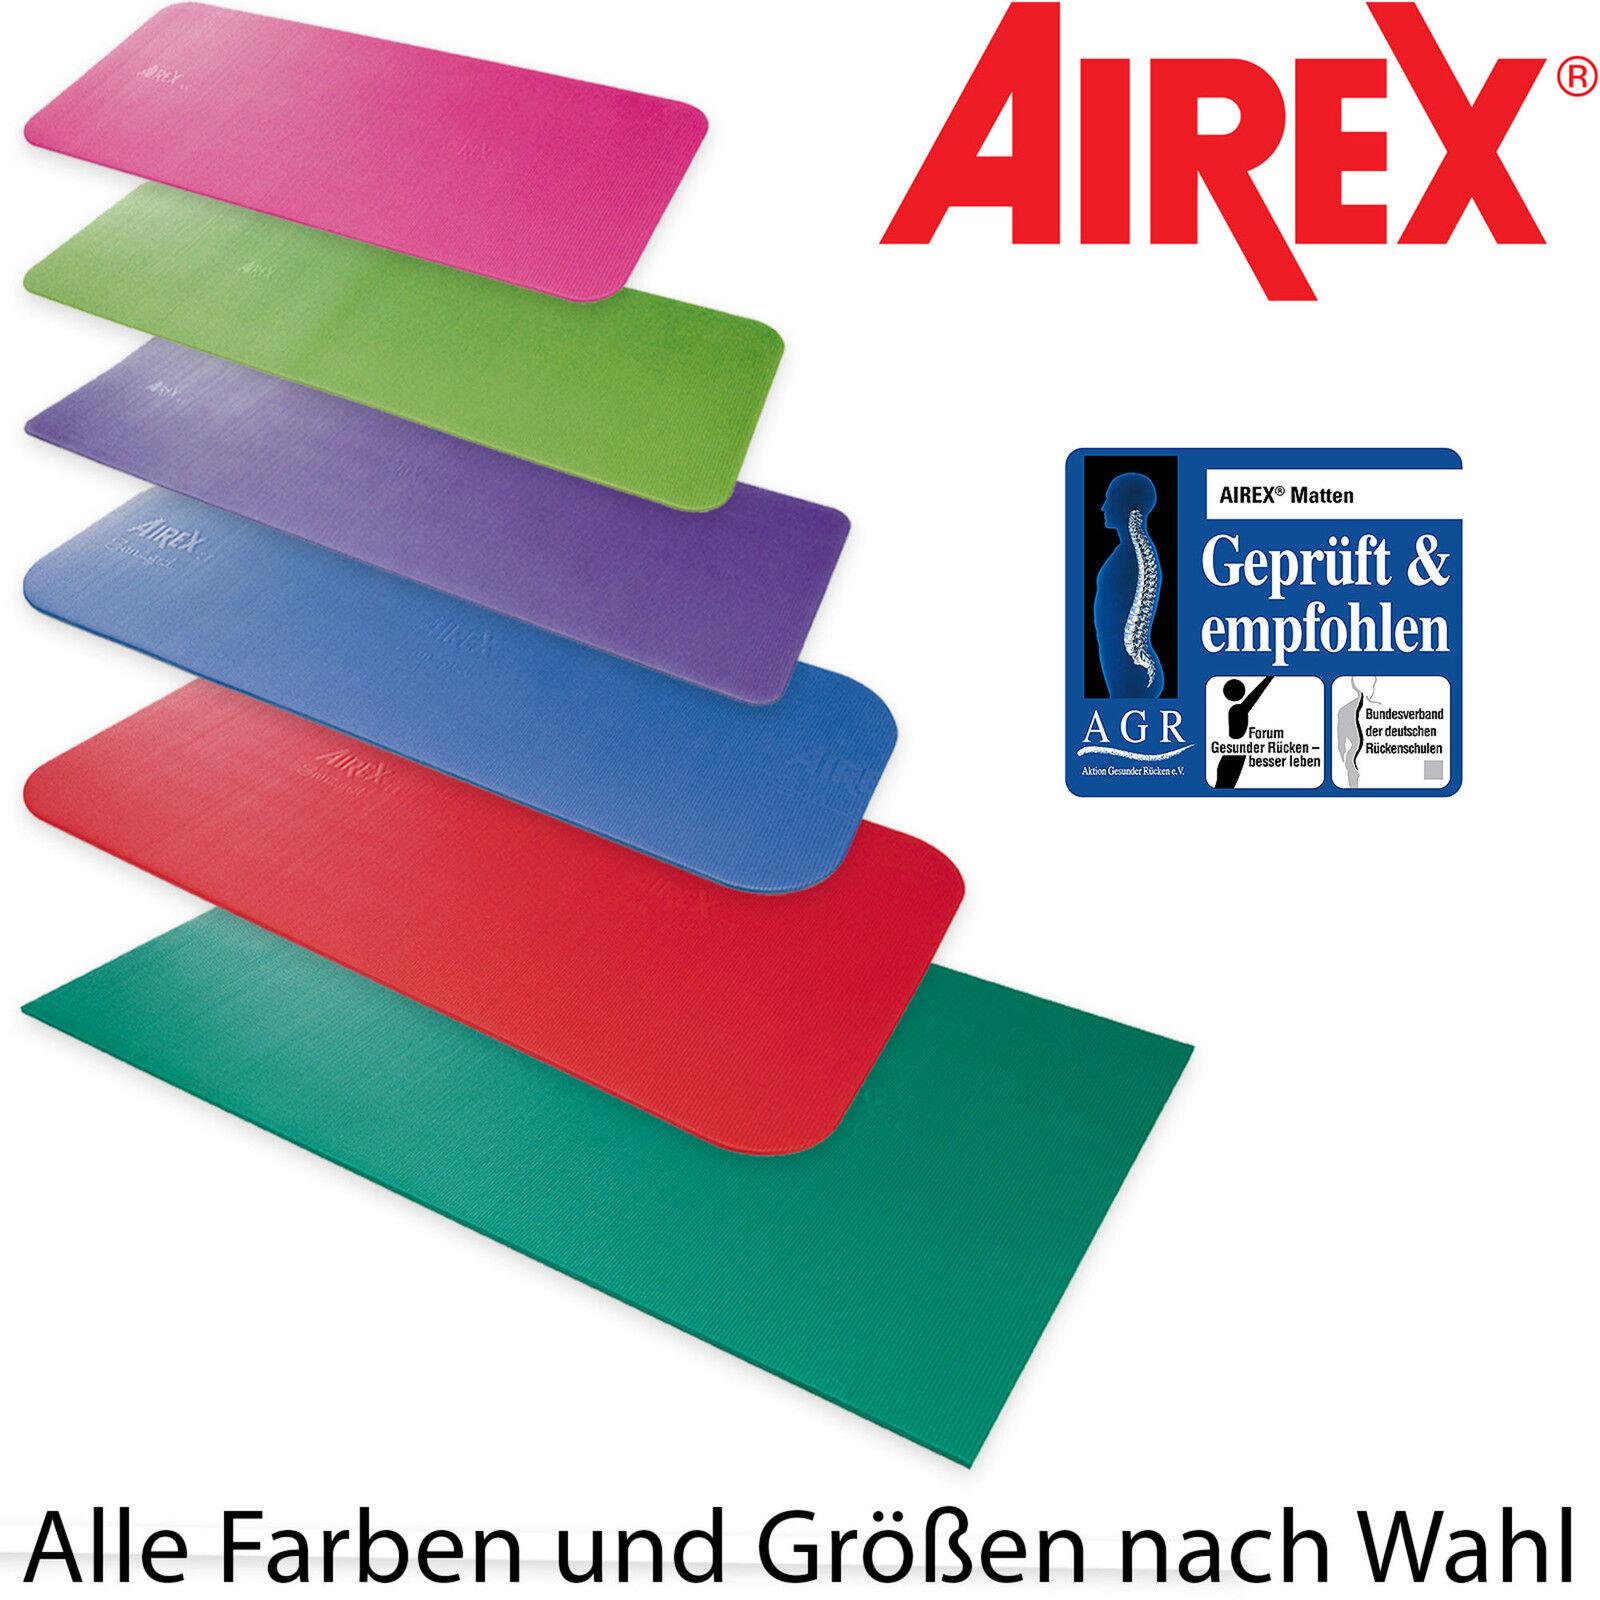 Gymnastikmatte AIREX® Matte Fitness Fitline CGoldna CGoldnella Hercules Atlas Yoga